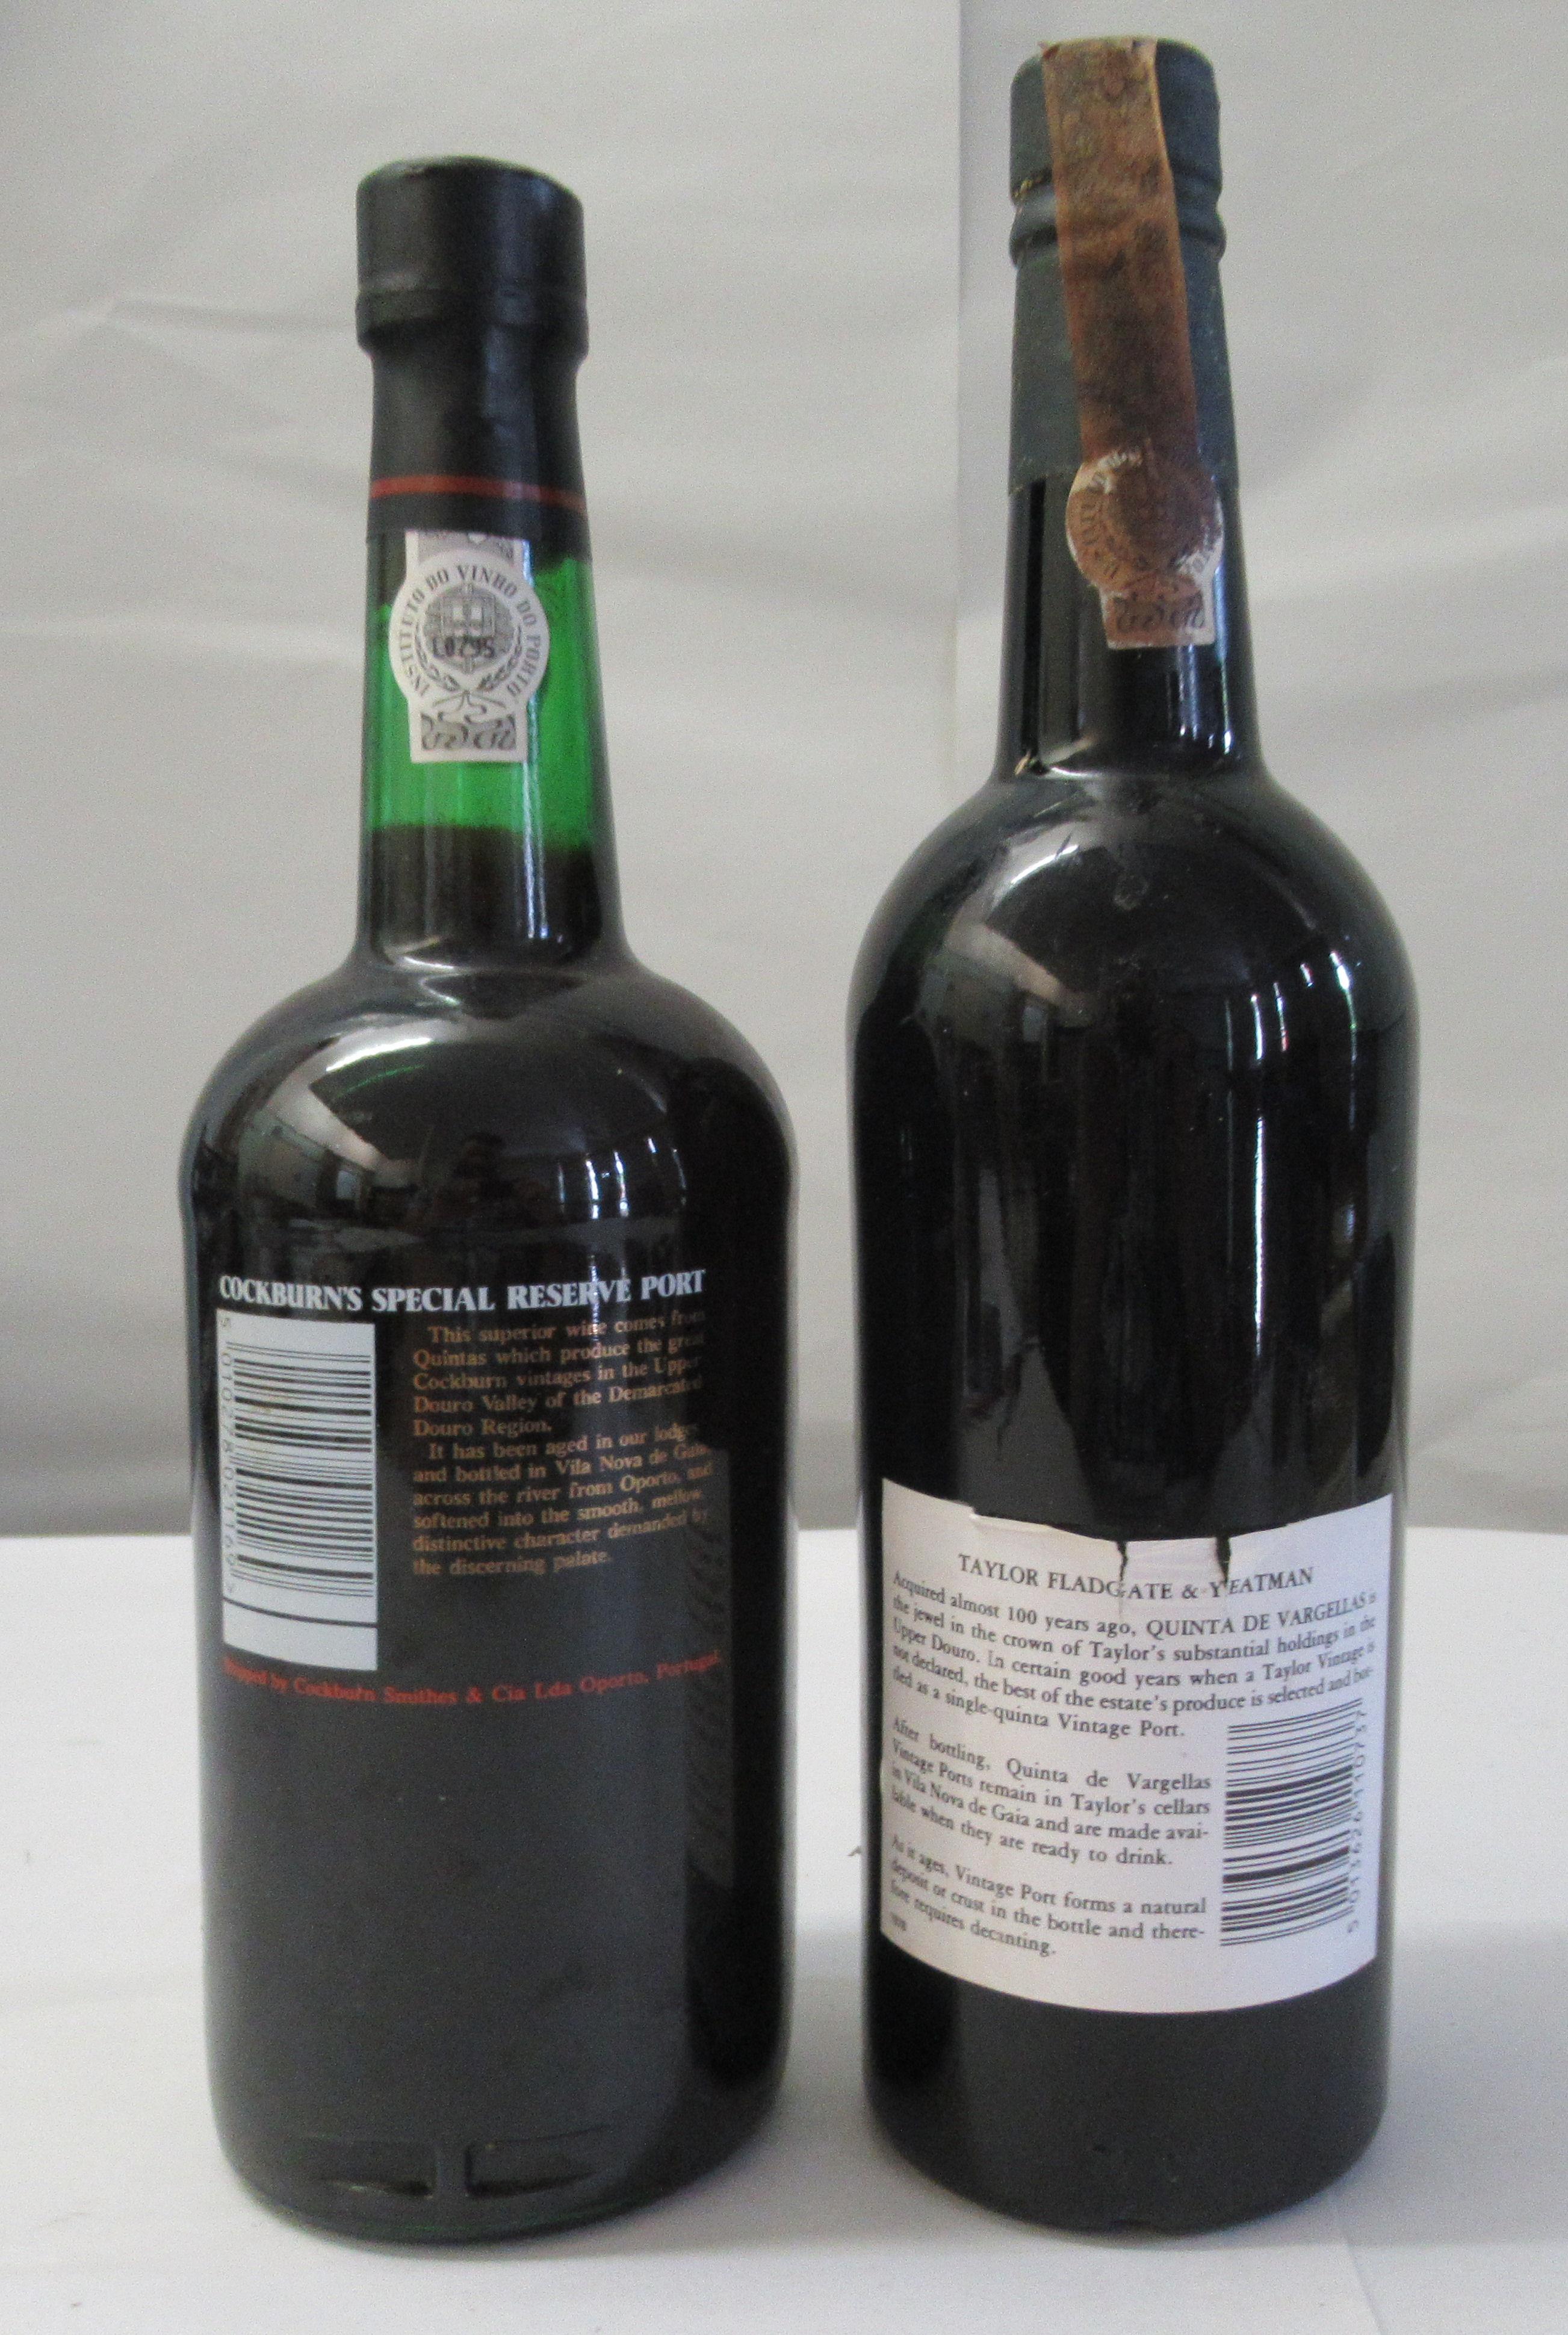 A bottle of Taylor's 1978 vintage port; and another bottle of Cockburn's port - Image 4 of 5